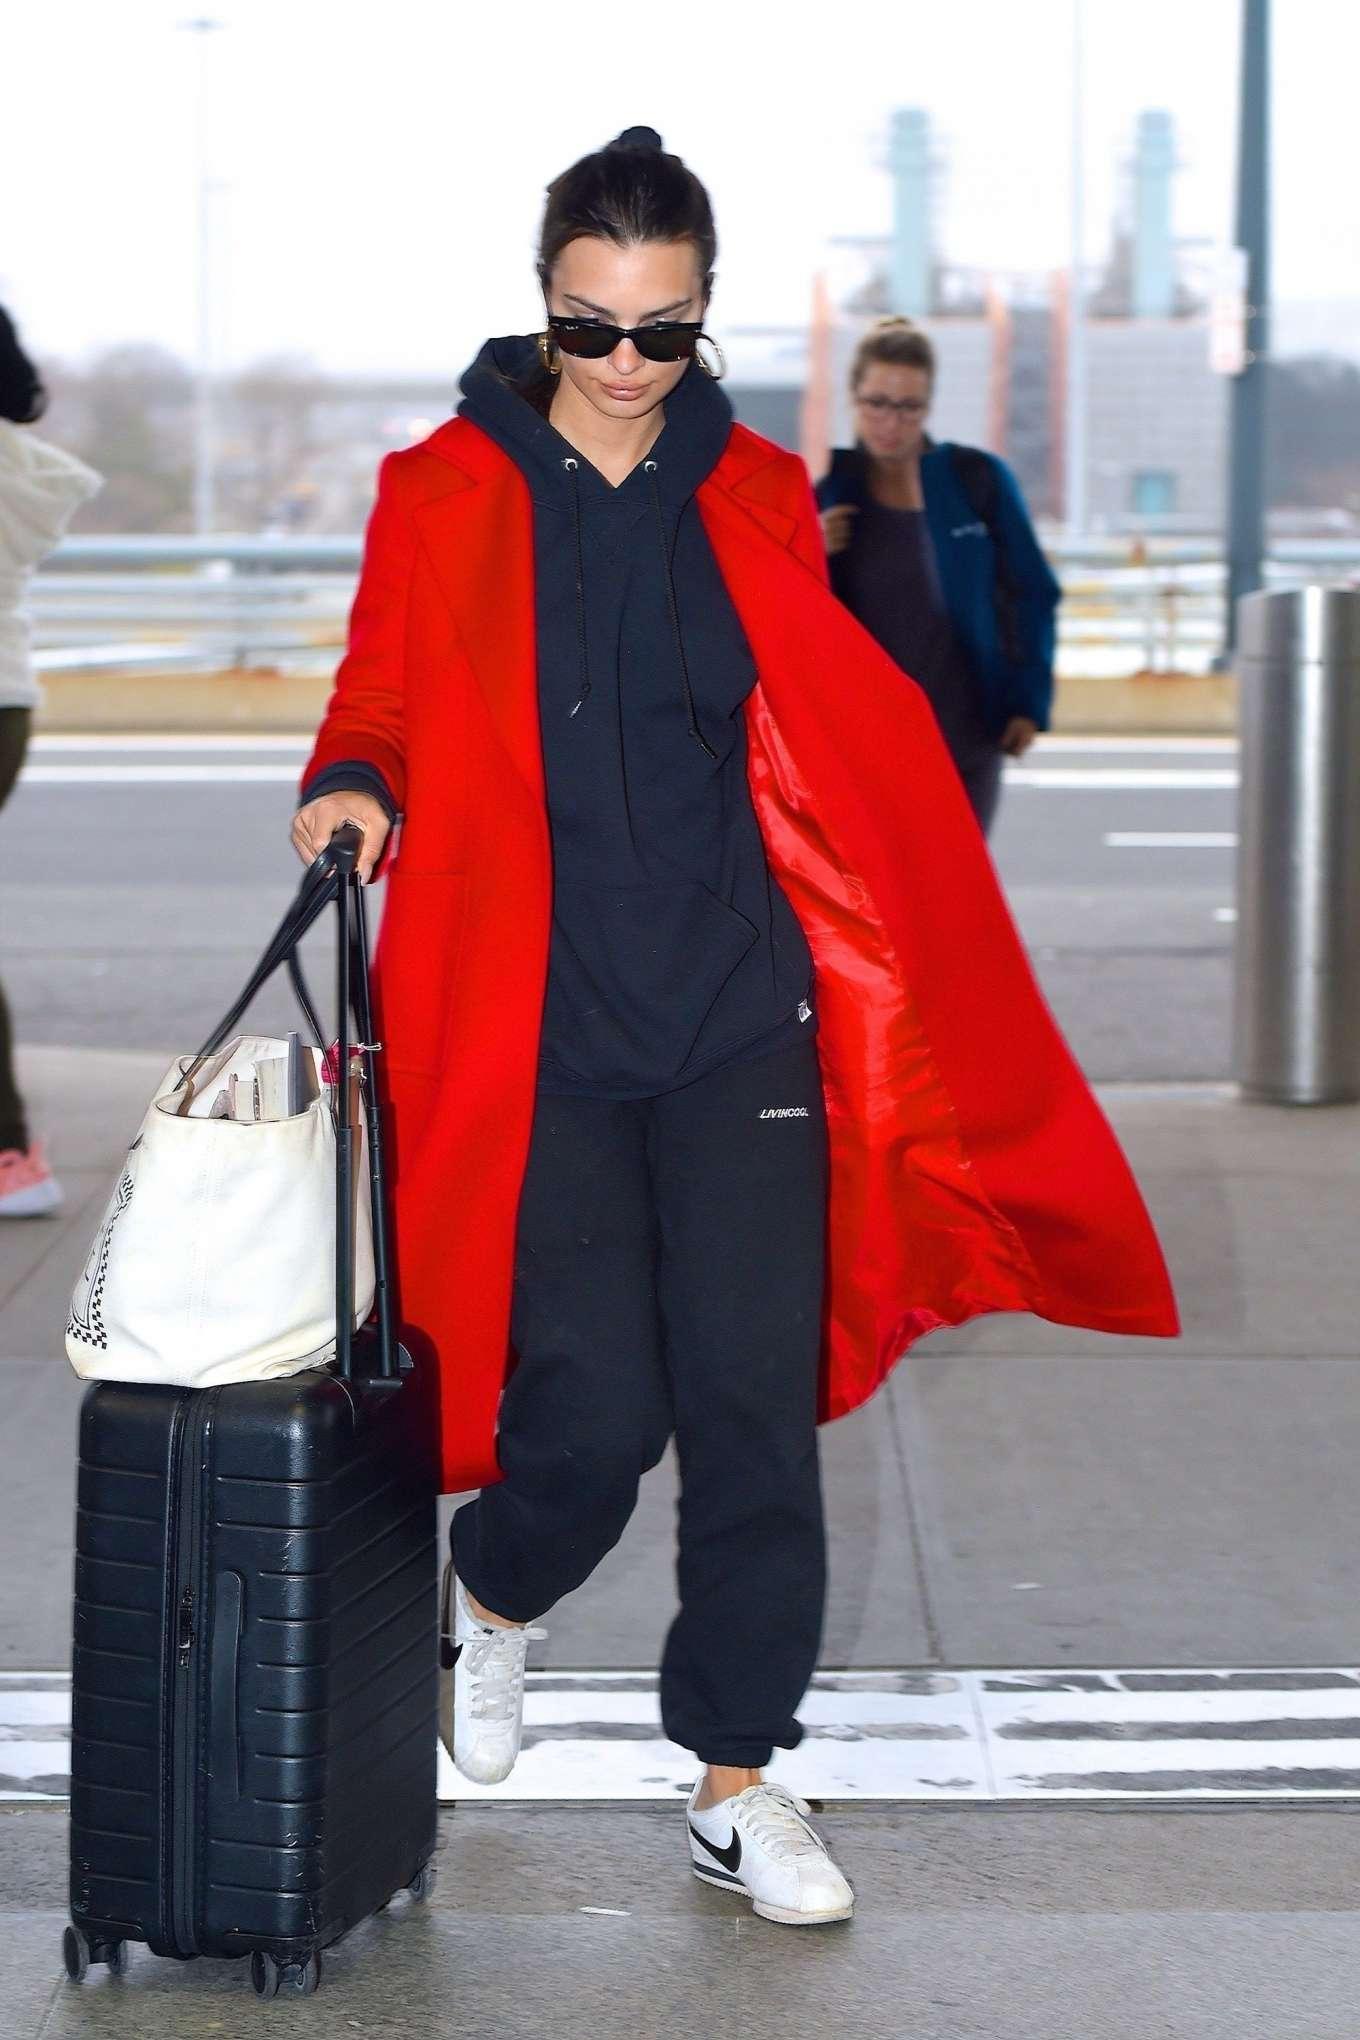 Emily Ratajkowski 2020 : Emily Ratajkowski in red coat ready for flight at JFK airport-12